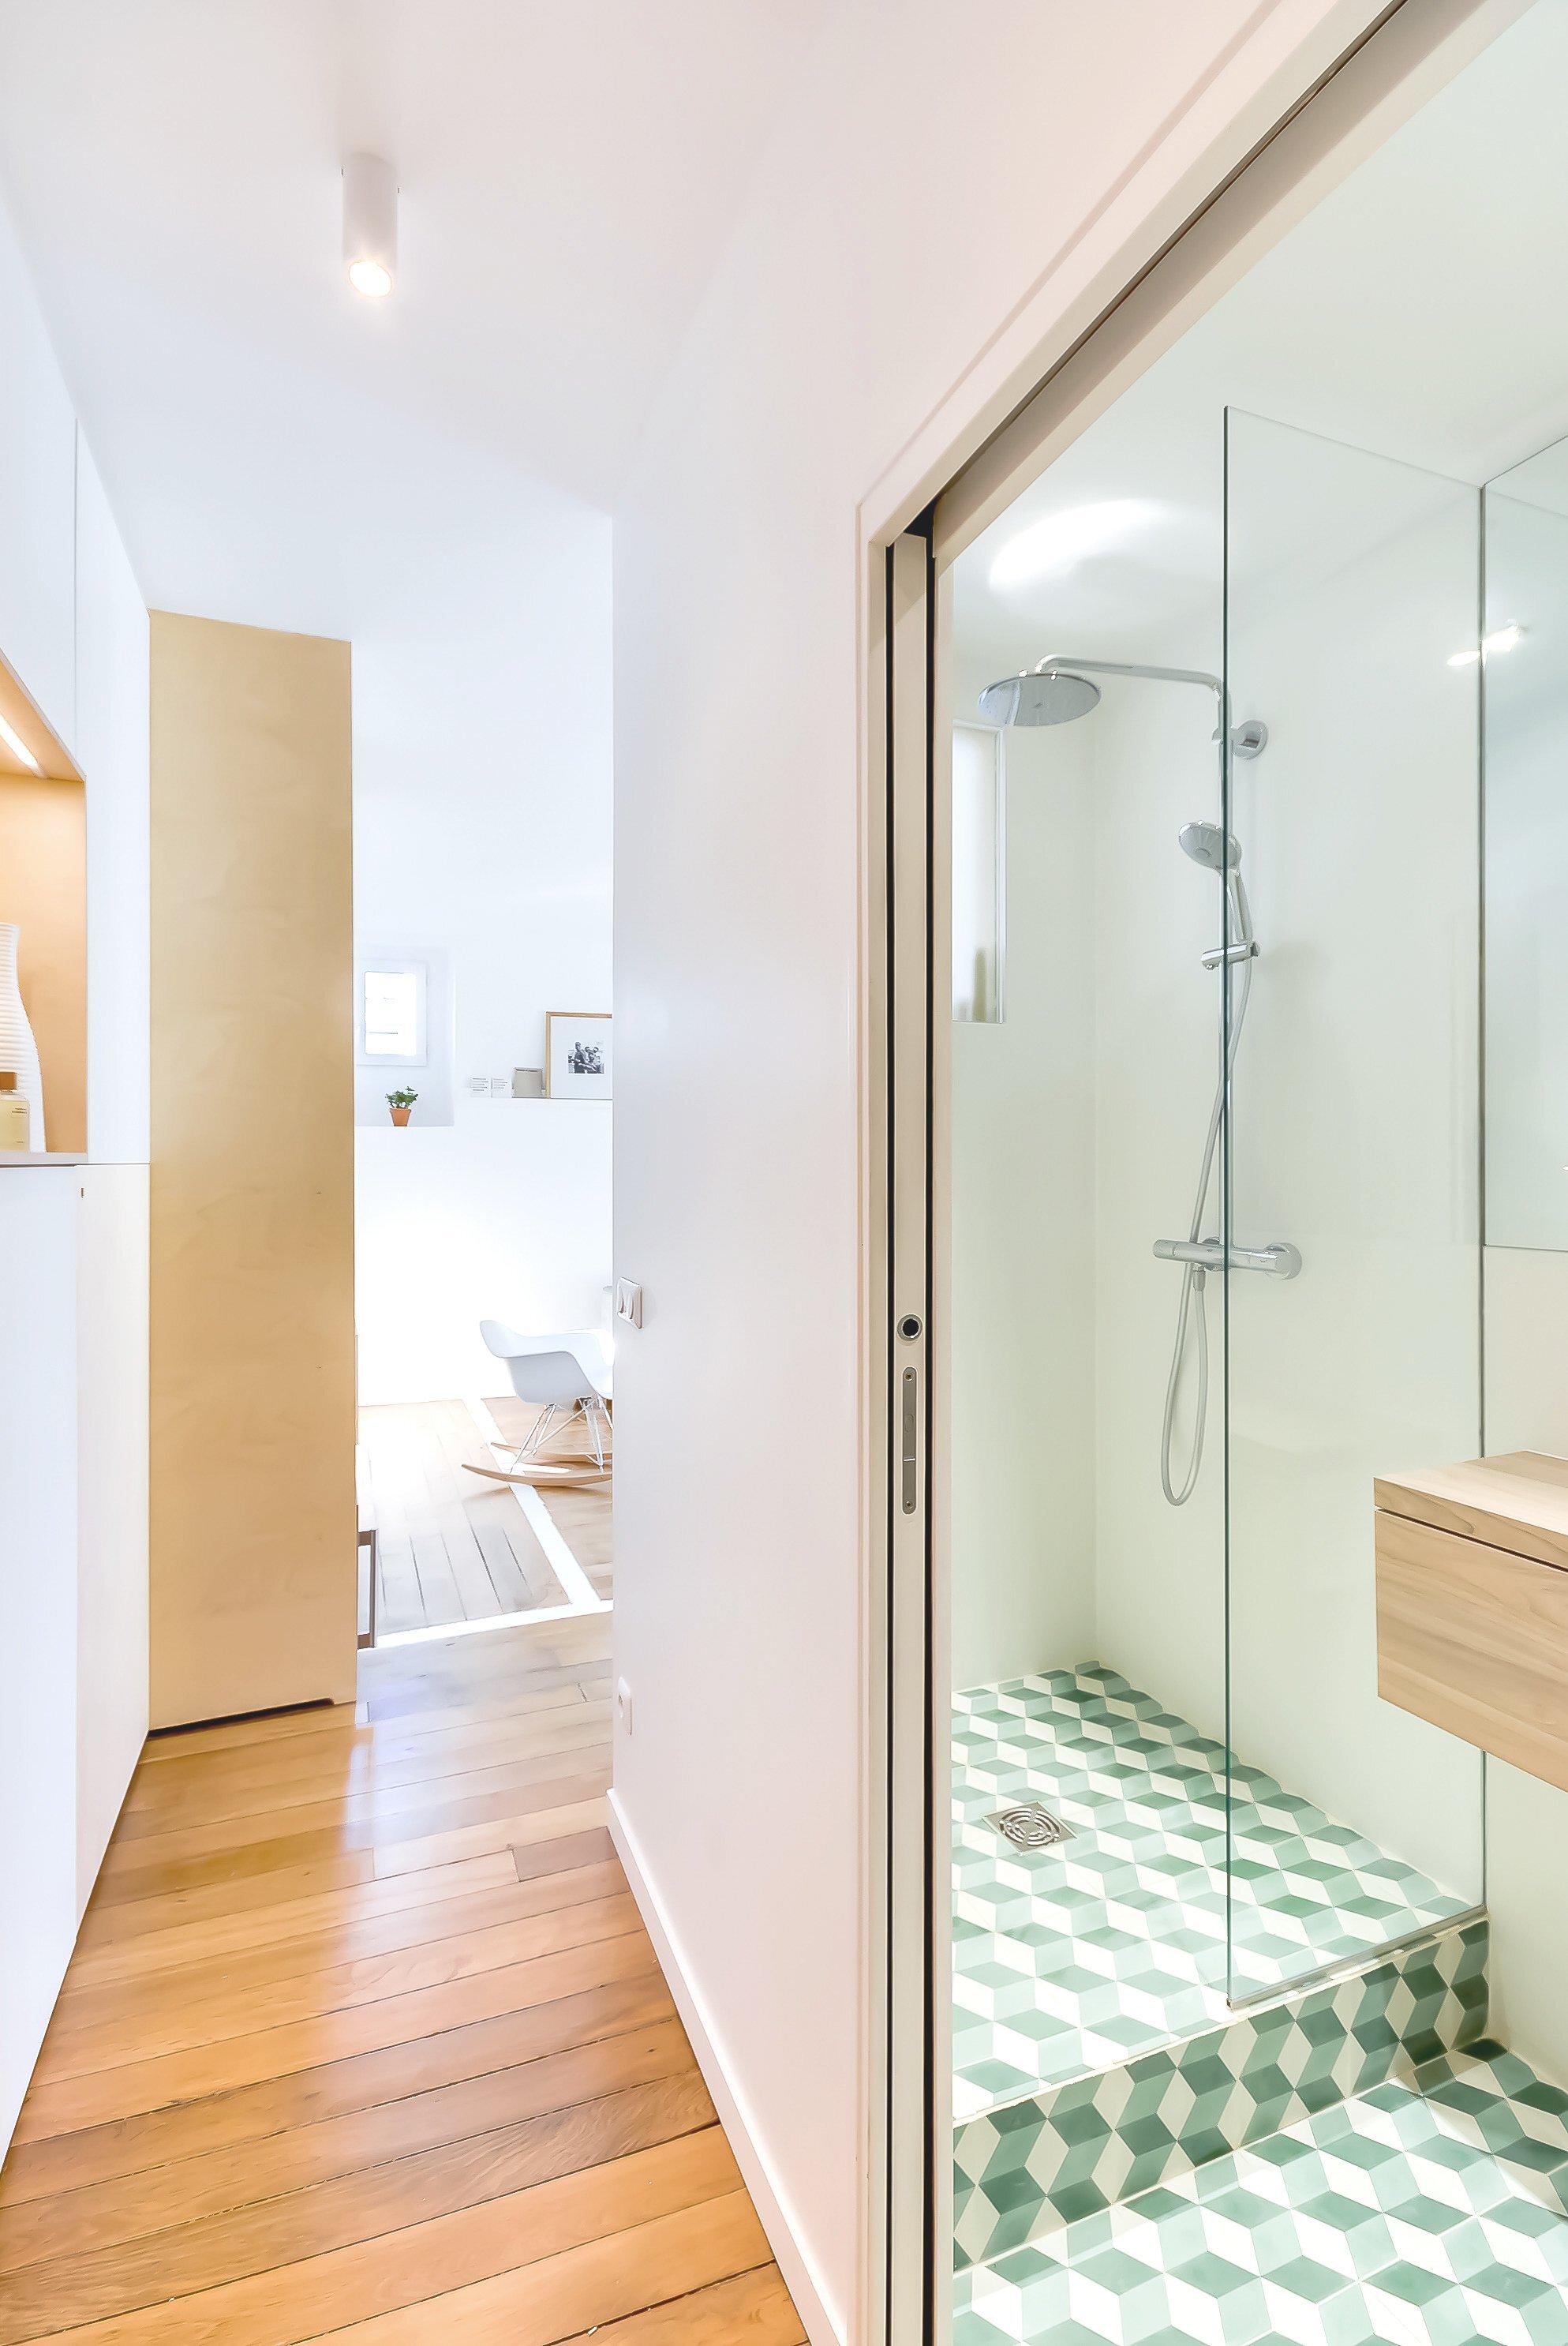 Flat in Paris - Small Apartment - Richard Guilbault - France - Bathroom - Humble Homes